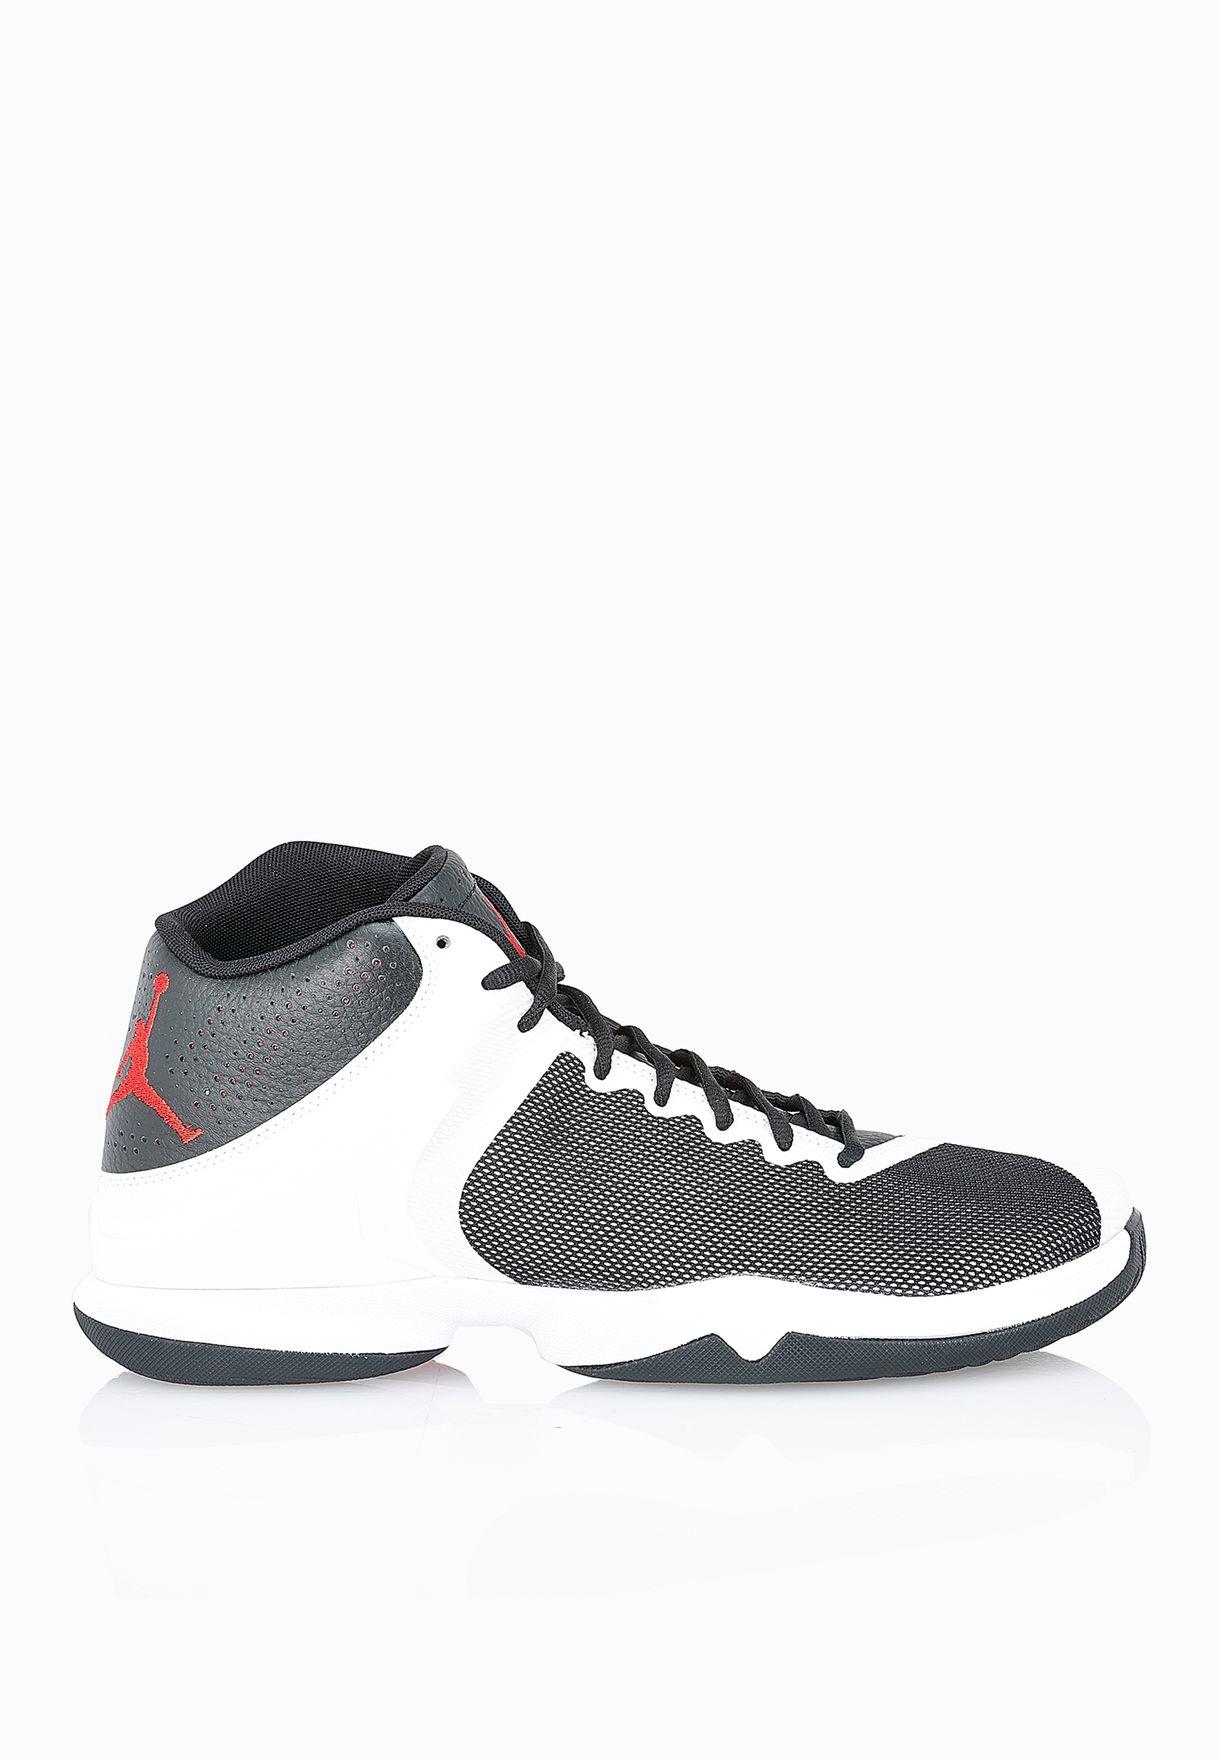 afd673a2772b Shop Nike monochrome Jordan Super.Fly 4 Po 819163-002 for Men in UAE ...